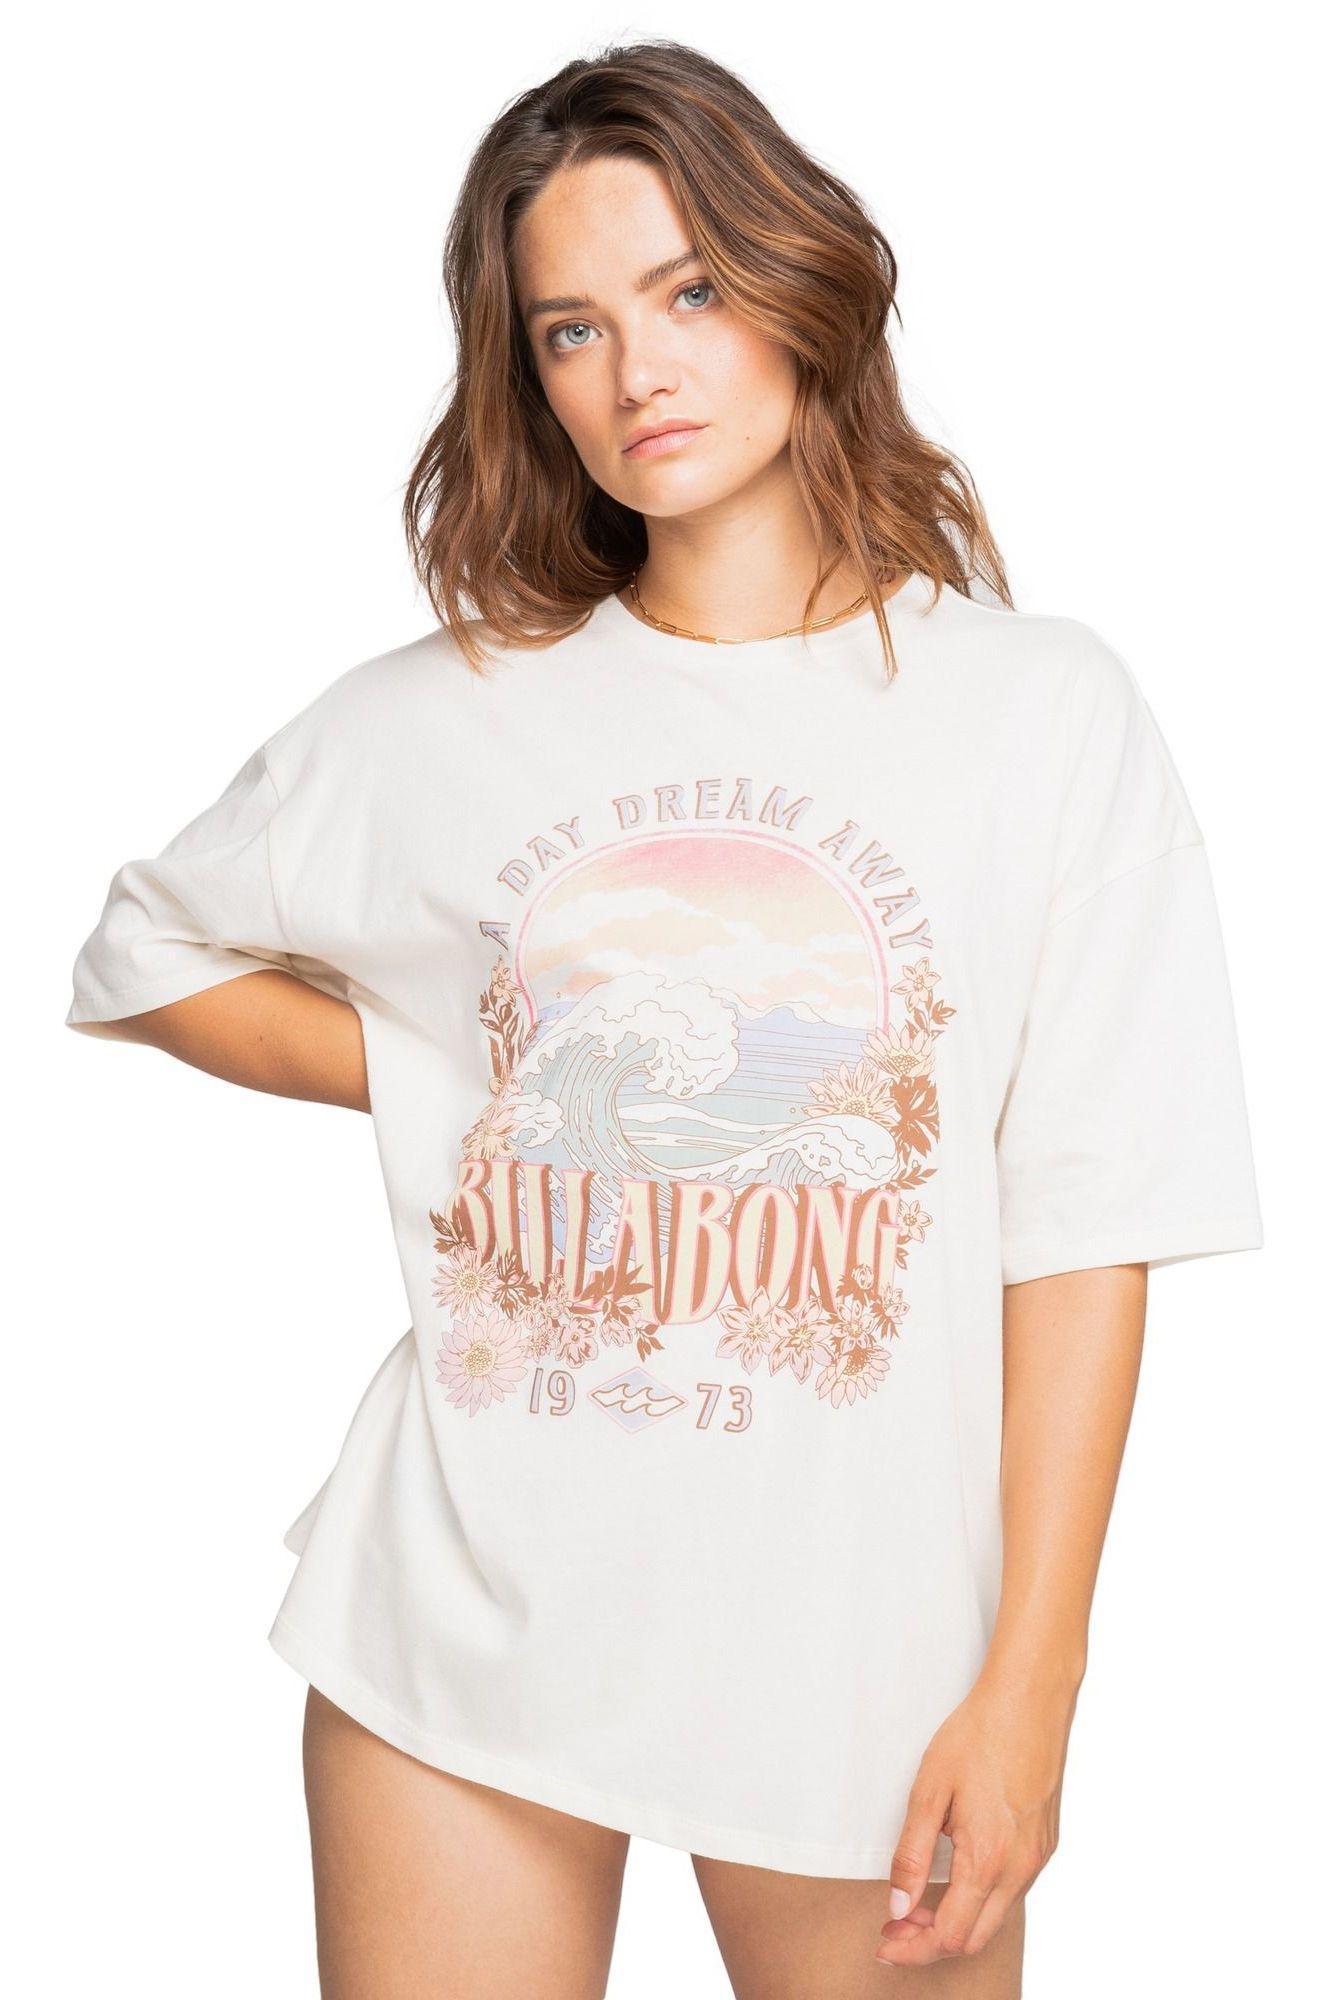 Billabong T-Shirt DREAMY DAY SWEET SESSIONS Salt Crystal